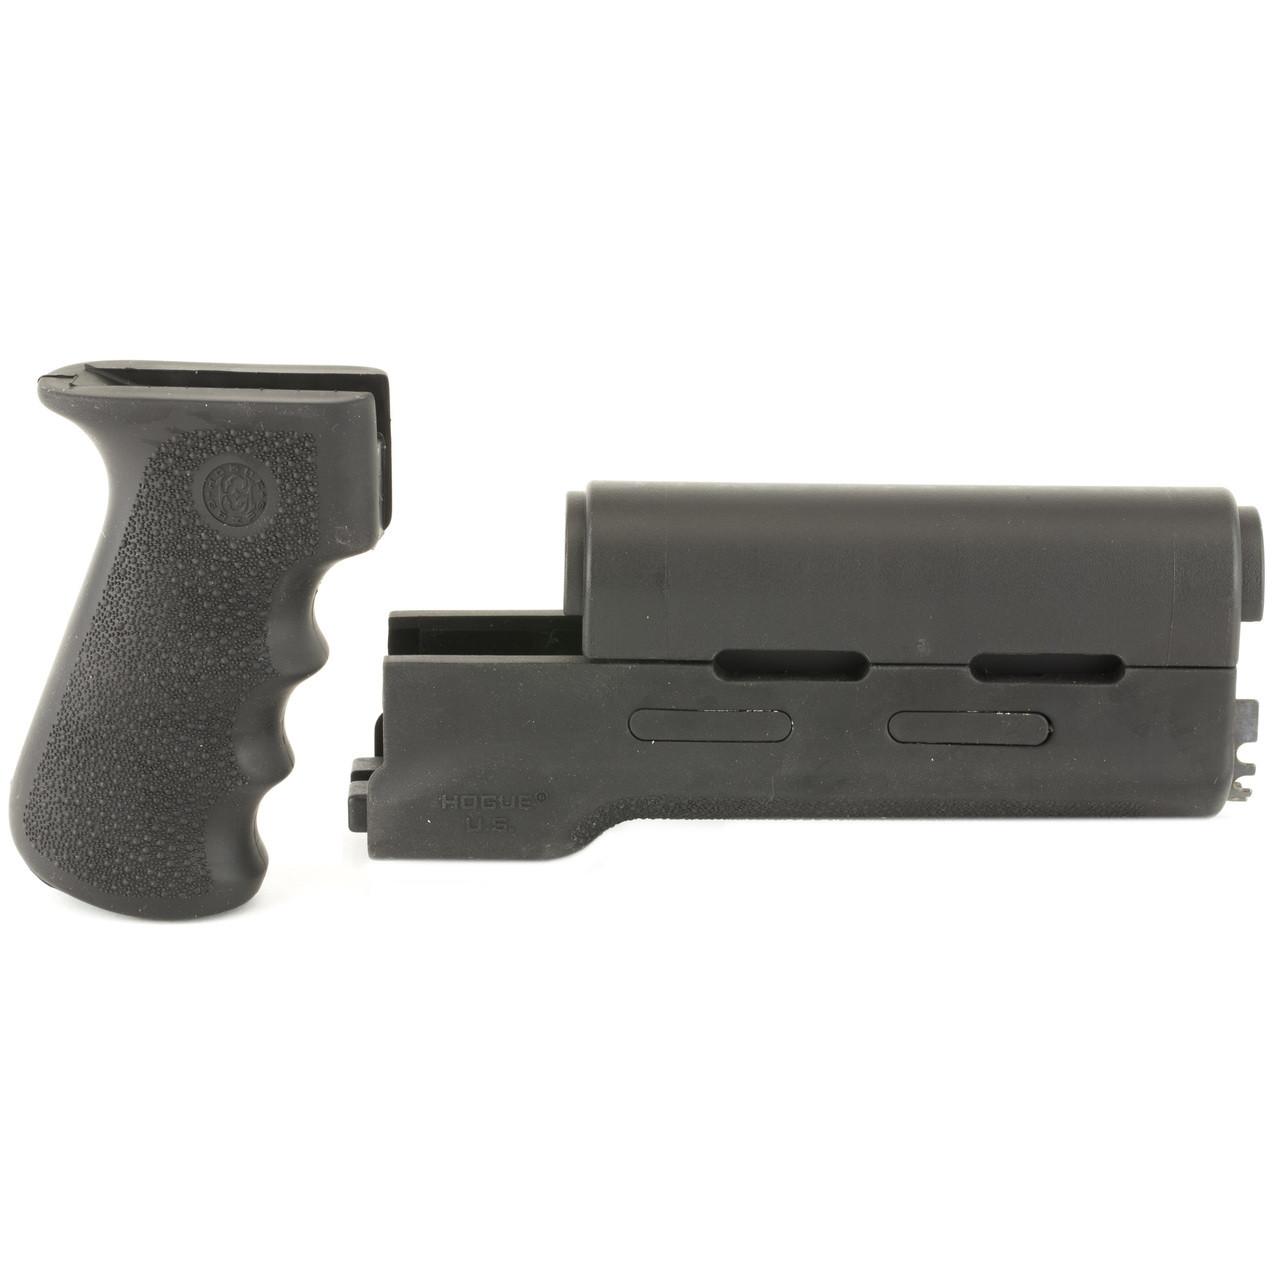 Hogue Grips OverMolded Grip/Forend Kit, Longer Yugo Version, Fits AK-47 &  AK-74 Variants, Black Finish 74018, UPC :743108740187